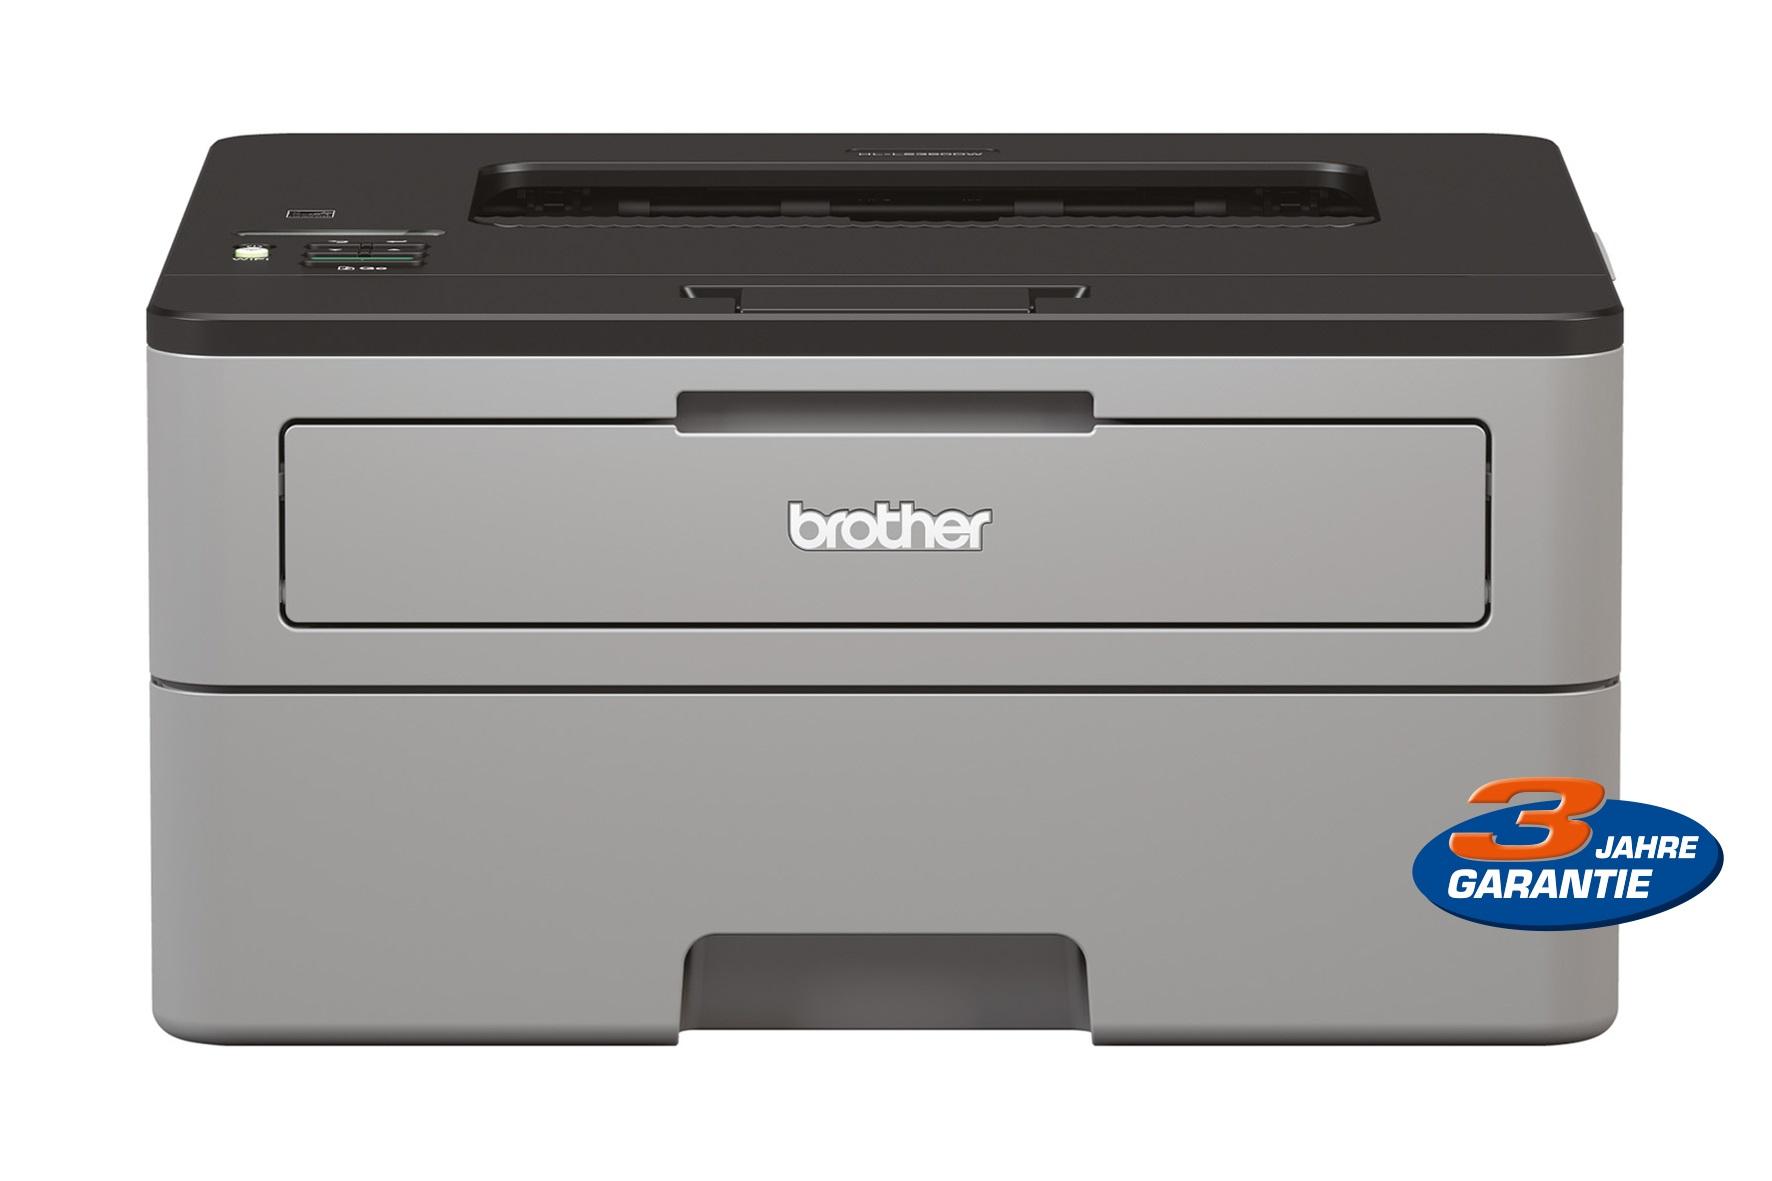 Brother HL-L2350DW printeris